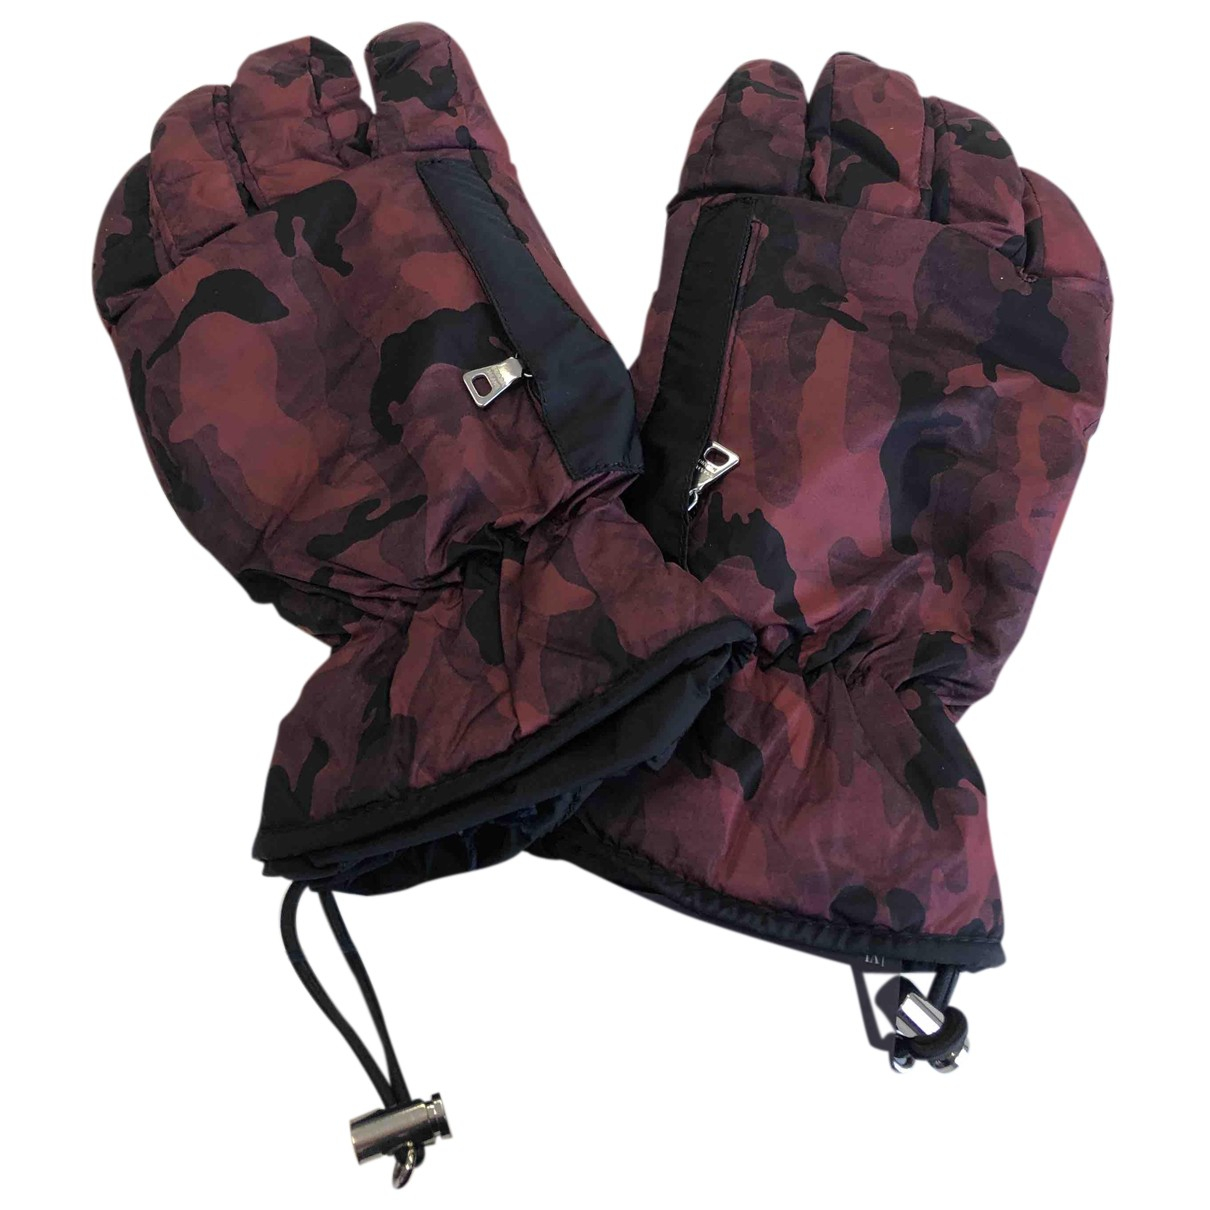 Prada N Gloves for Men 8.5 - 9 Inches